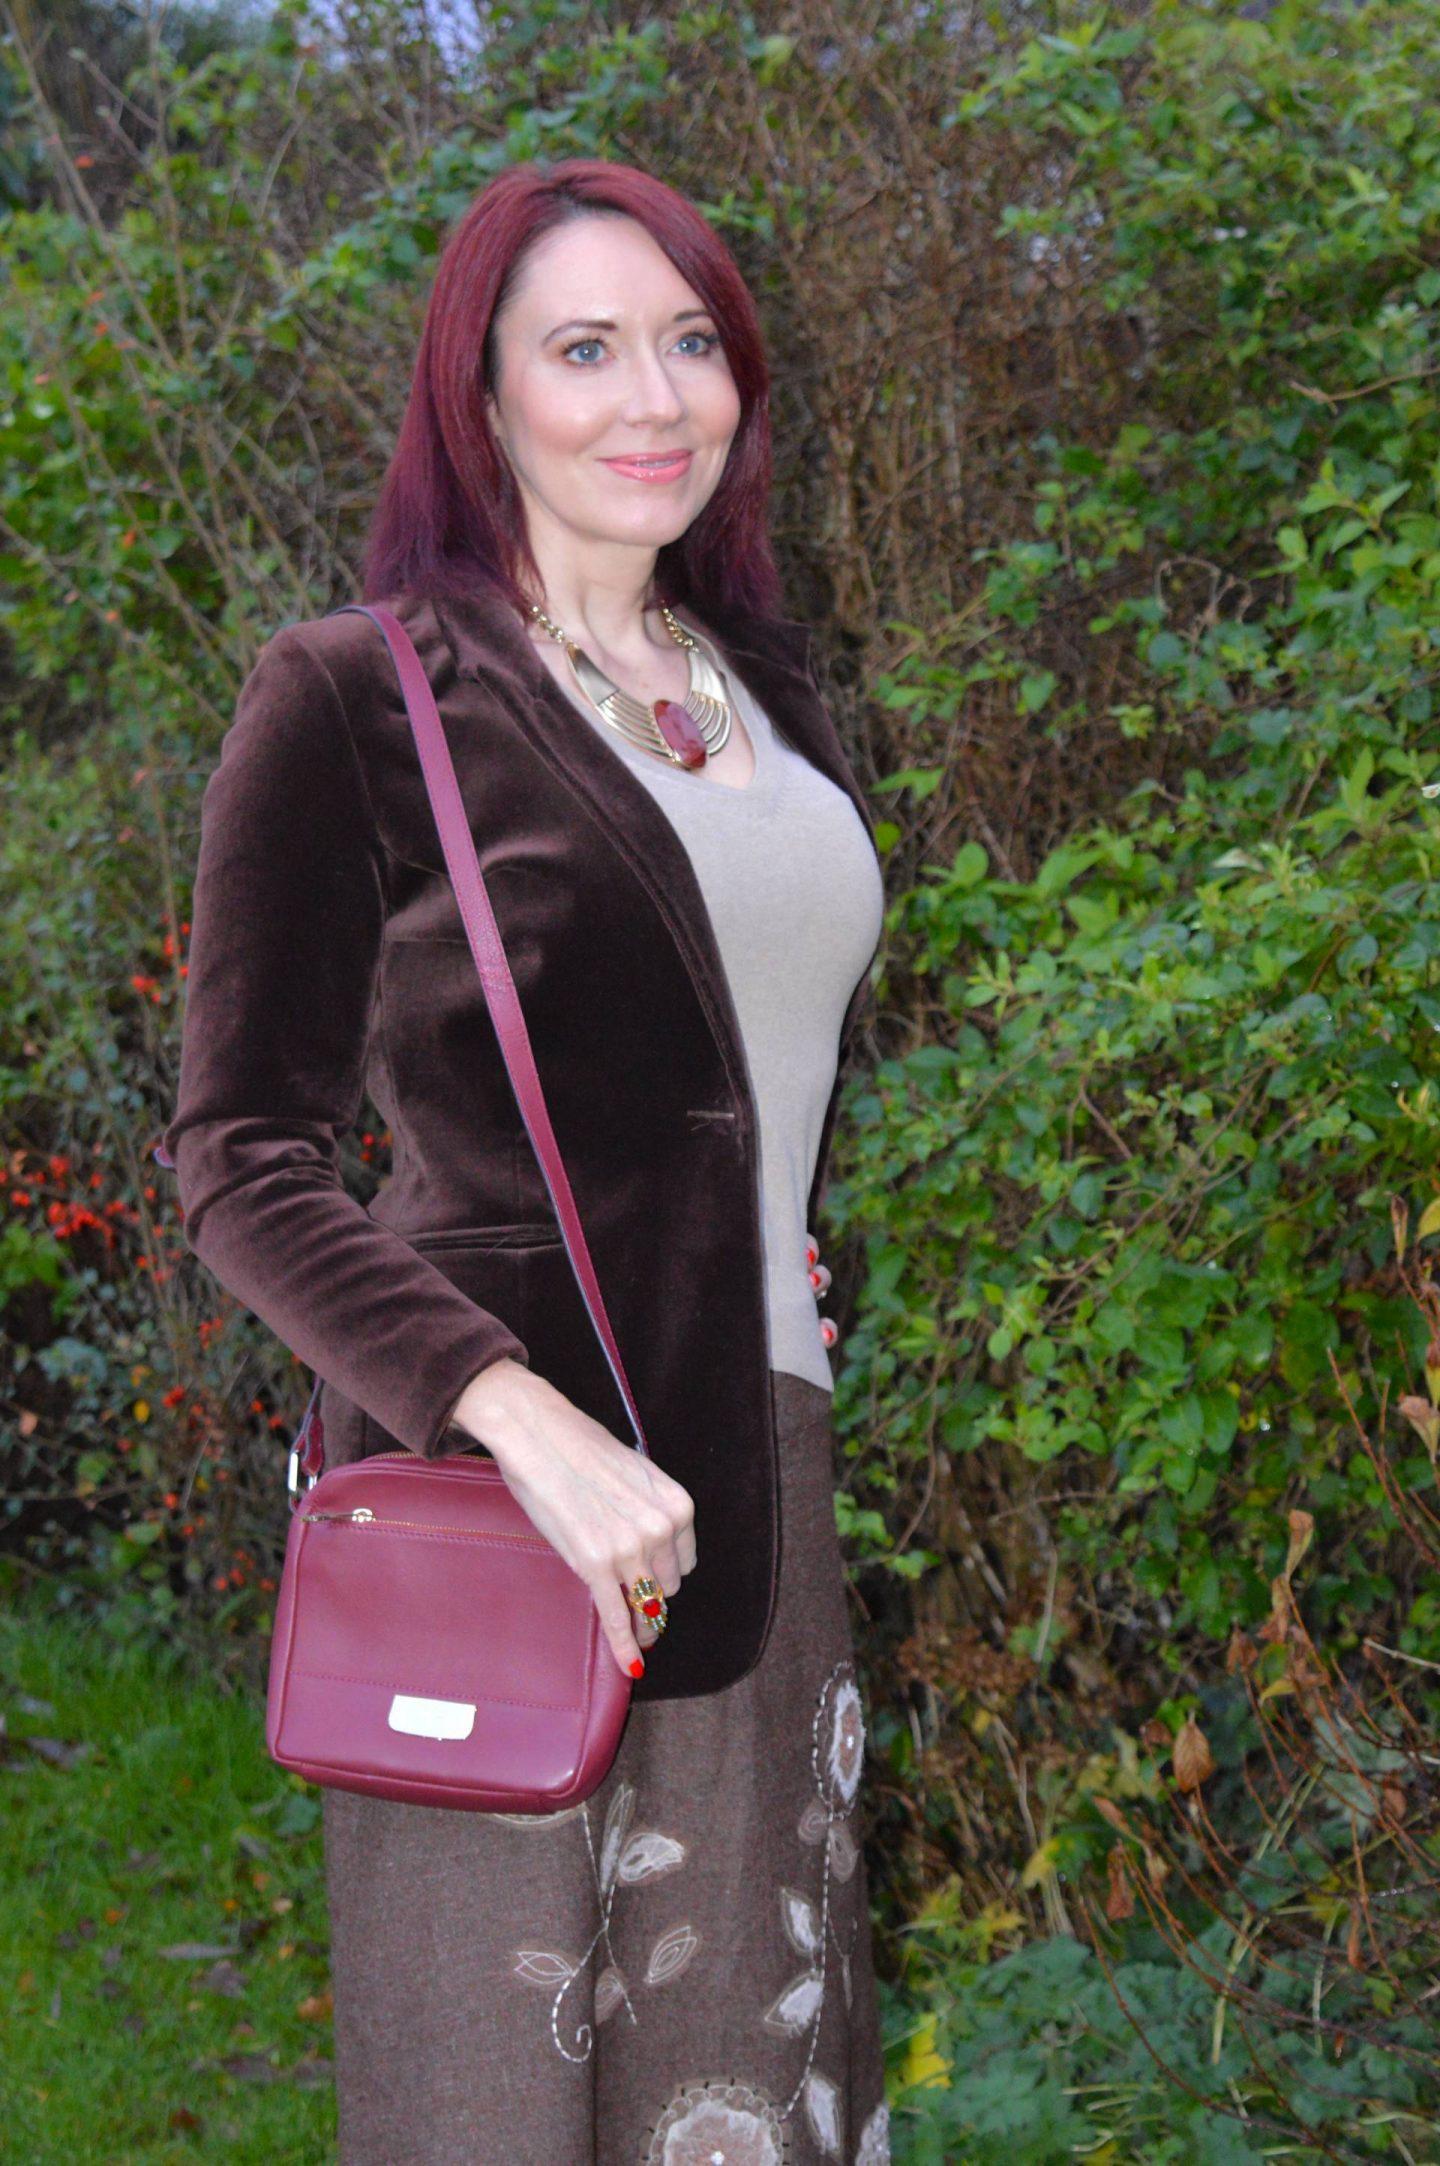 Paul Costelloe burgundy crossbody bag